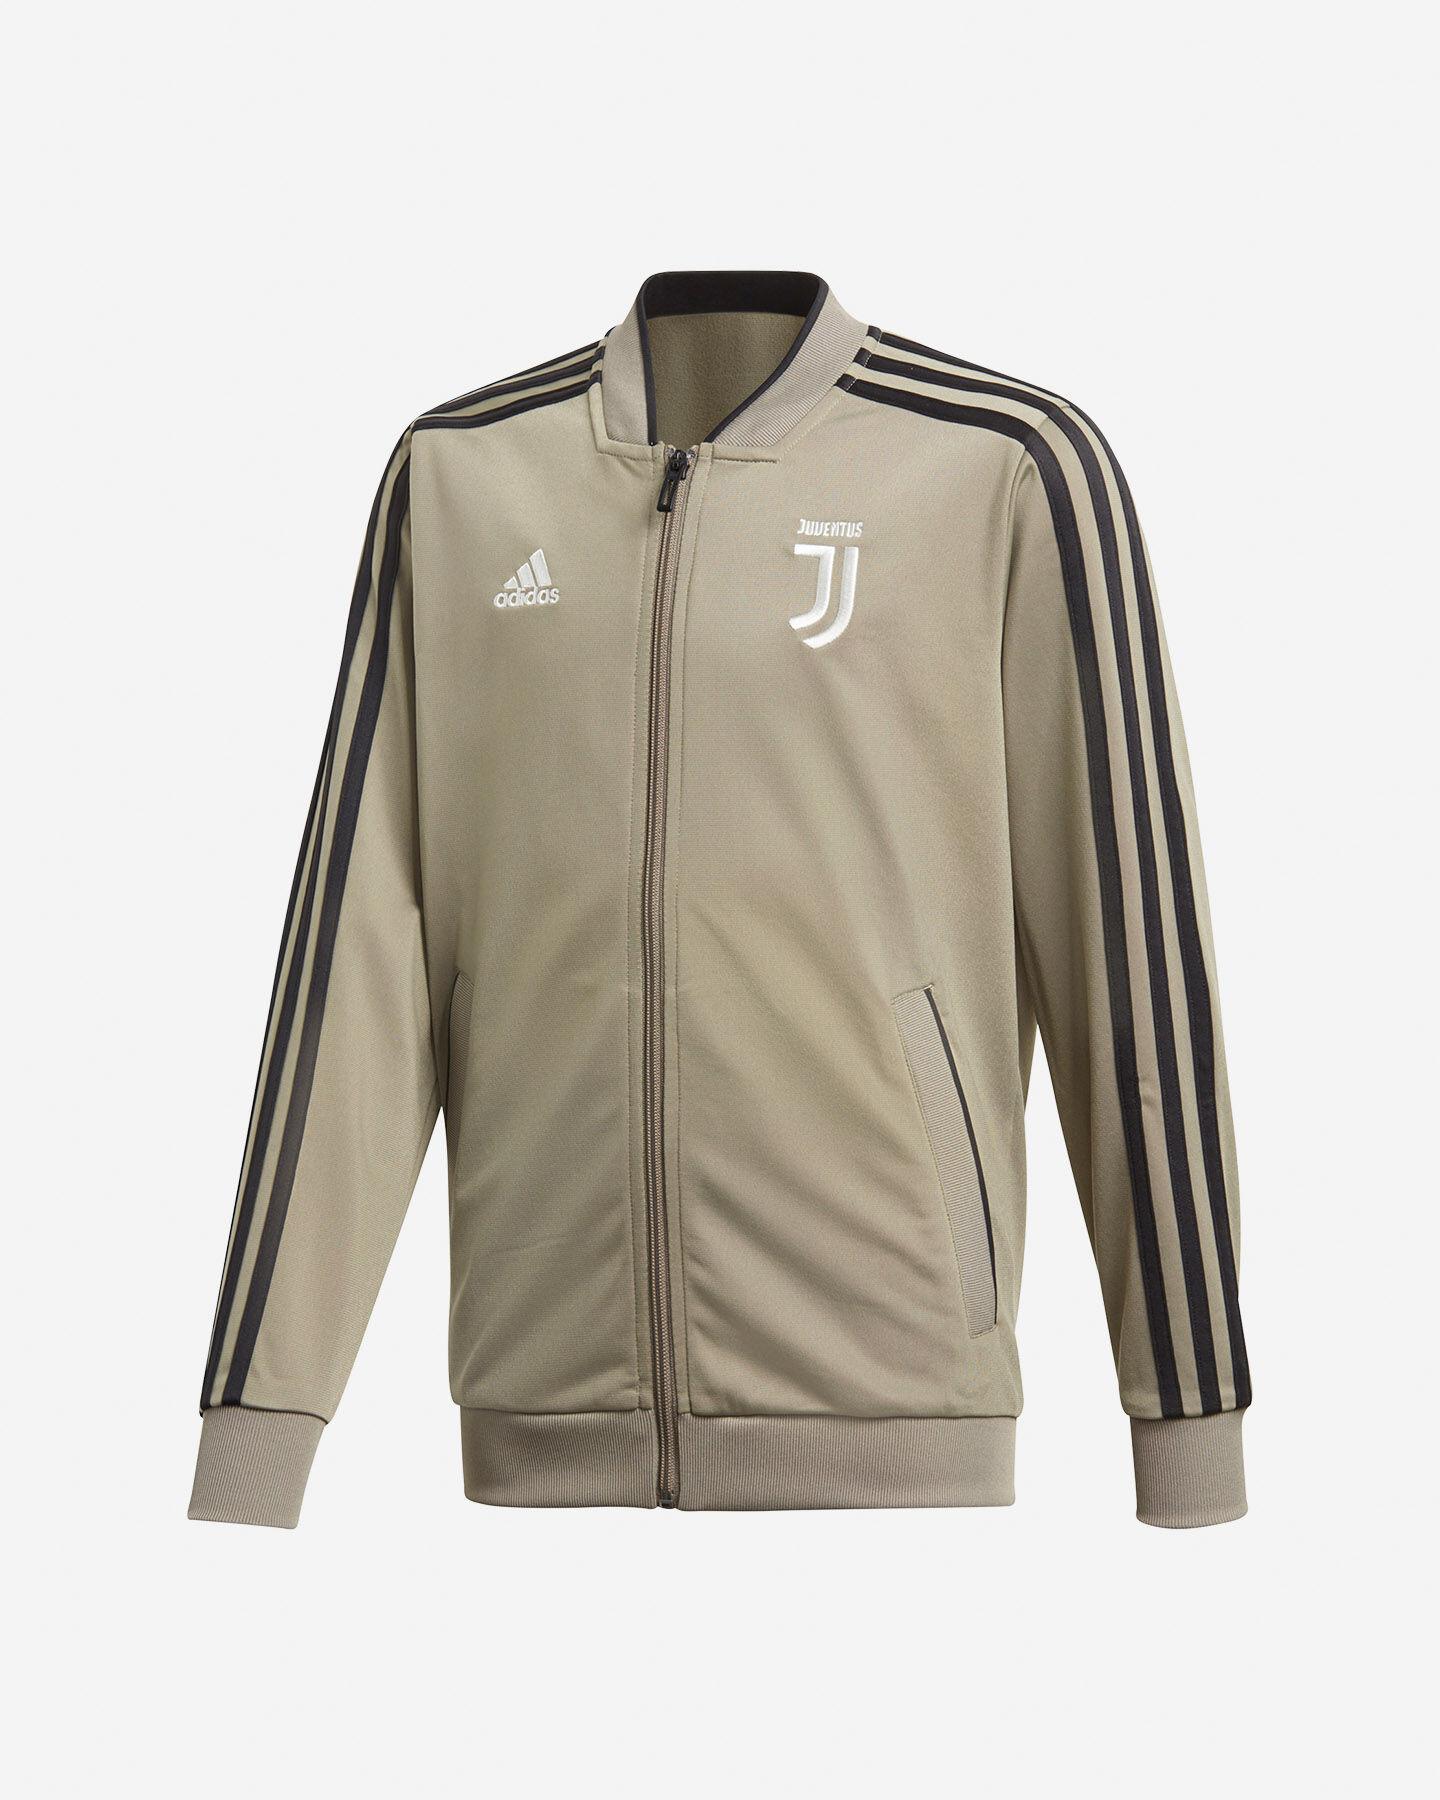 19 Juventus Calcio Tuta Adidas Cw8751 Sport Su Jacket Cisalfa Jr 18 4twRRqxU